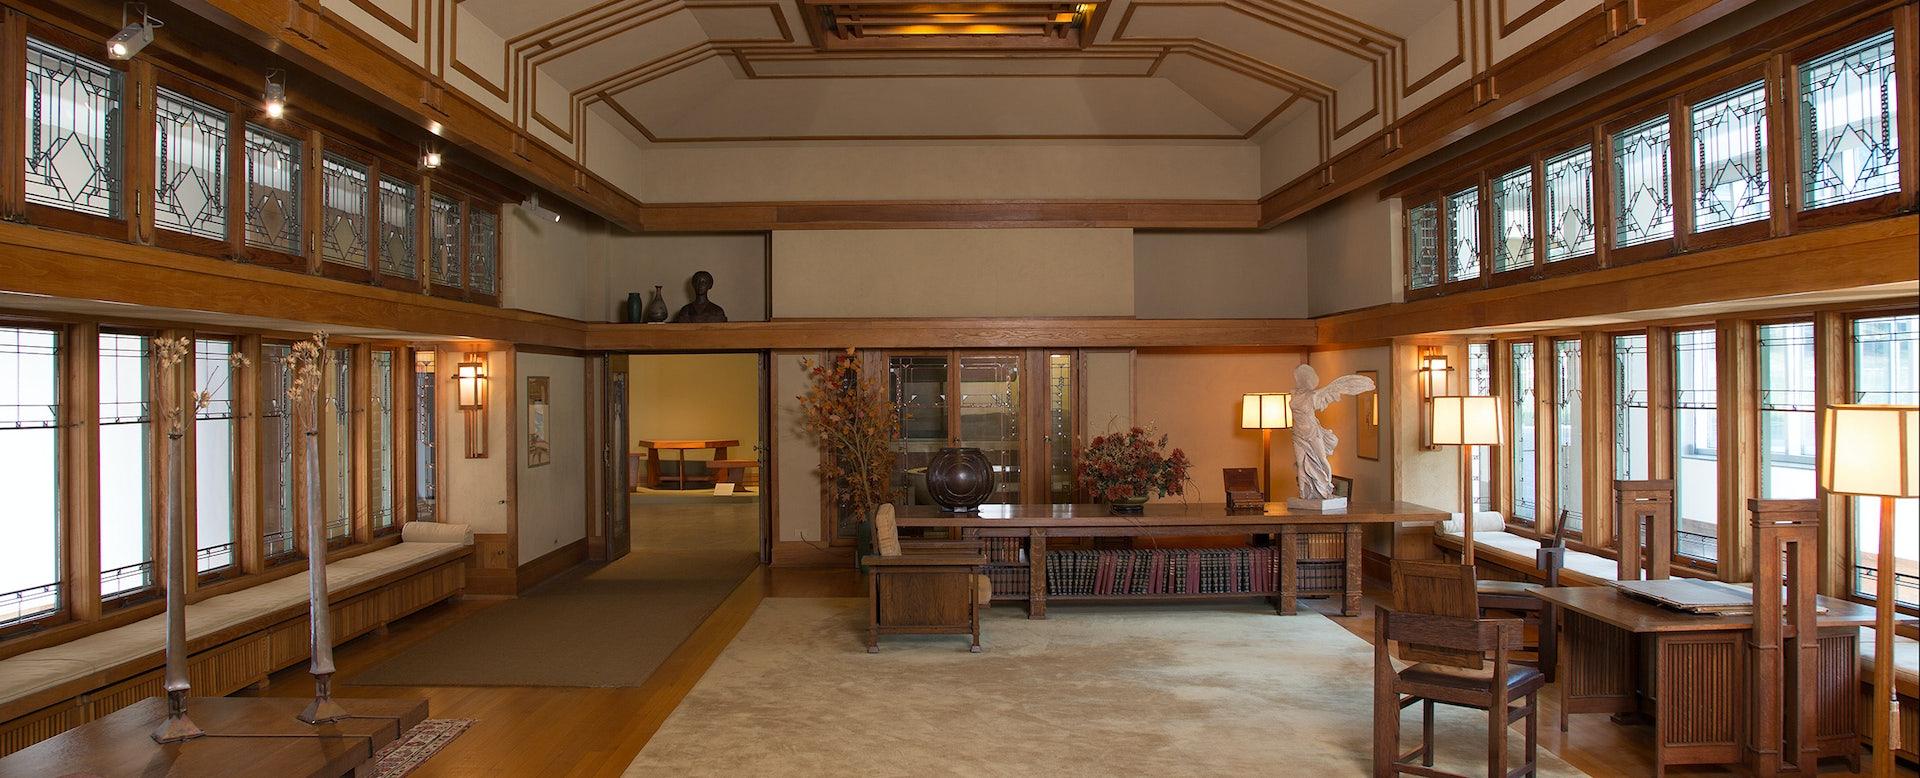 Frank Lloyd Wright Room at the Met